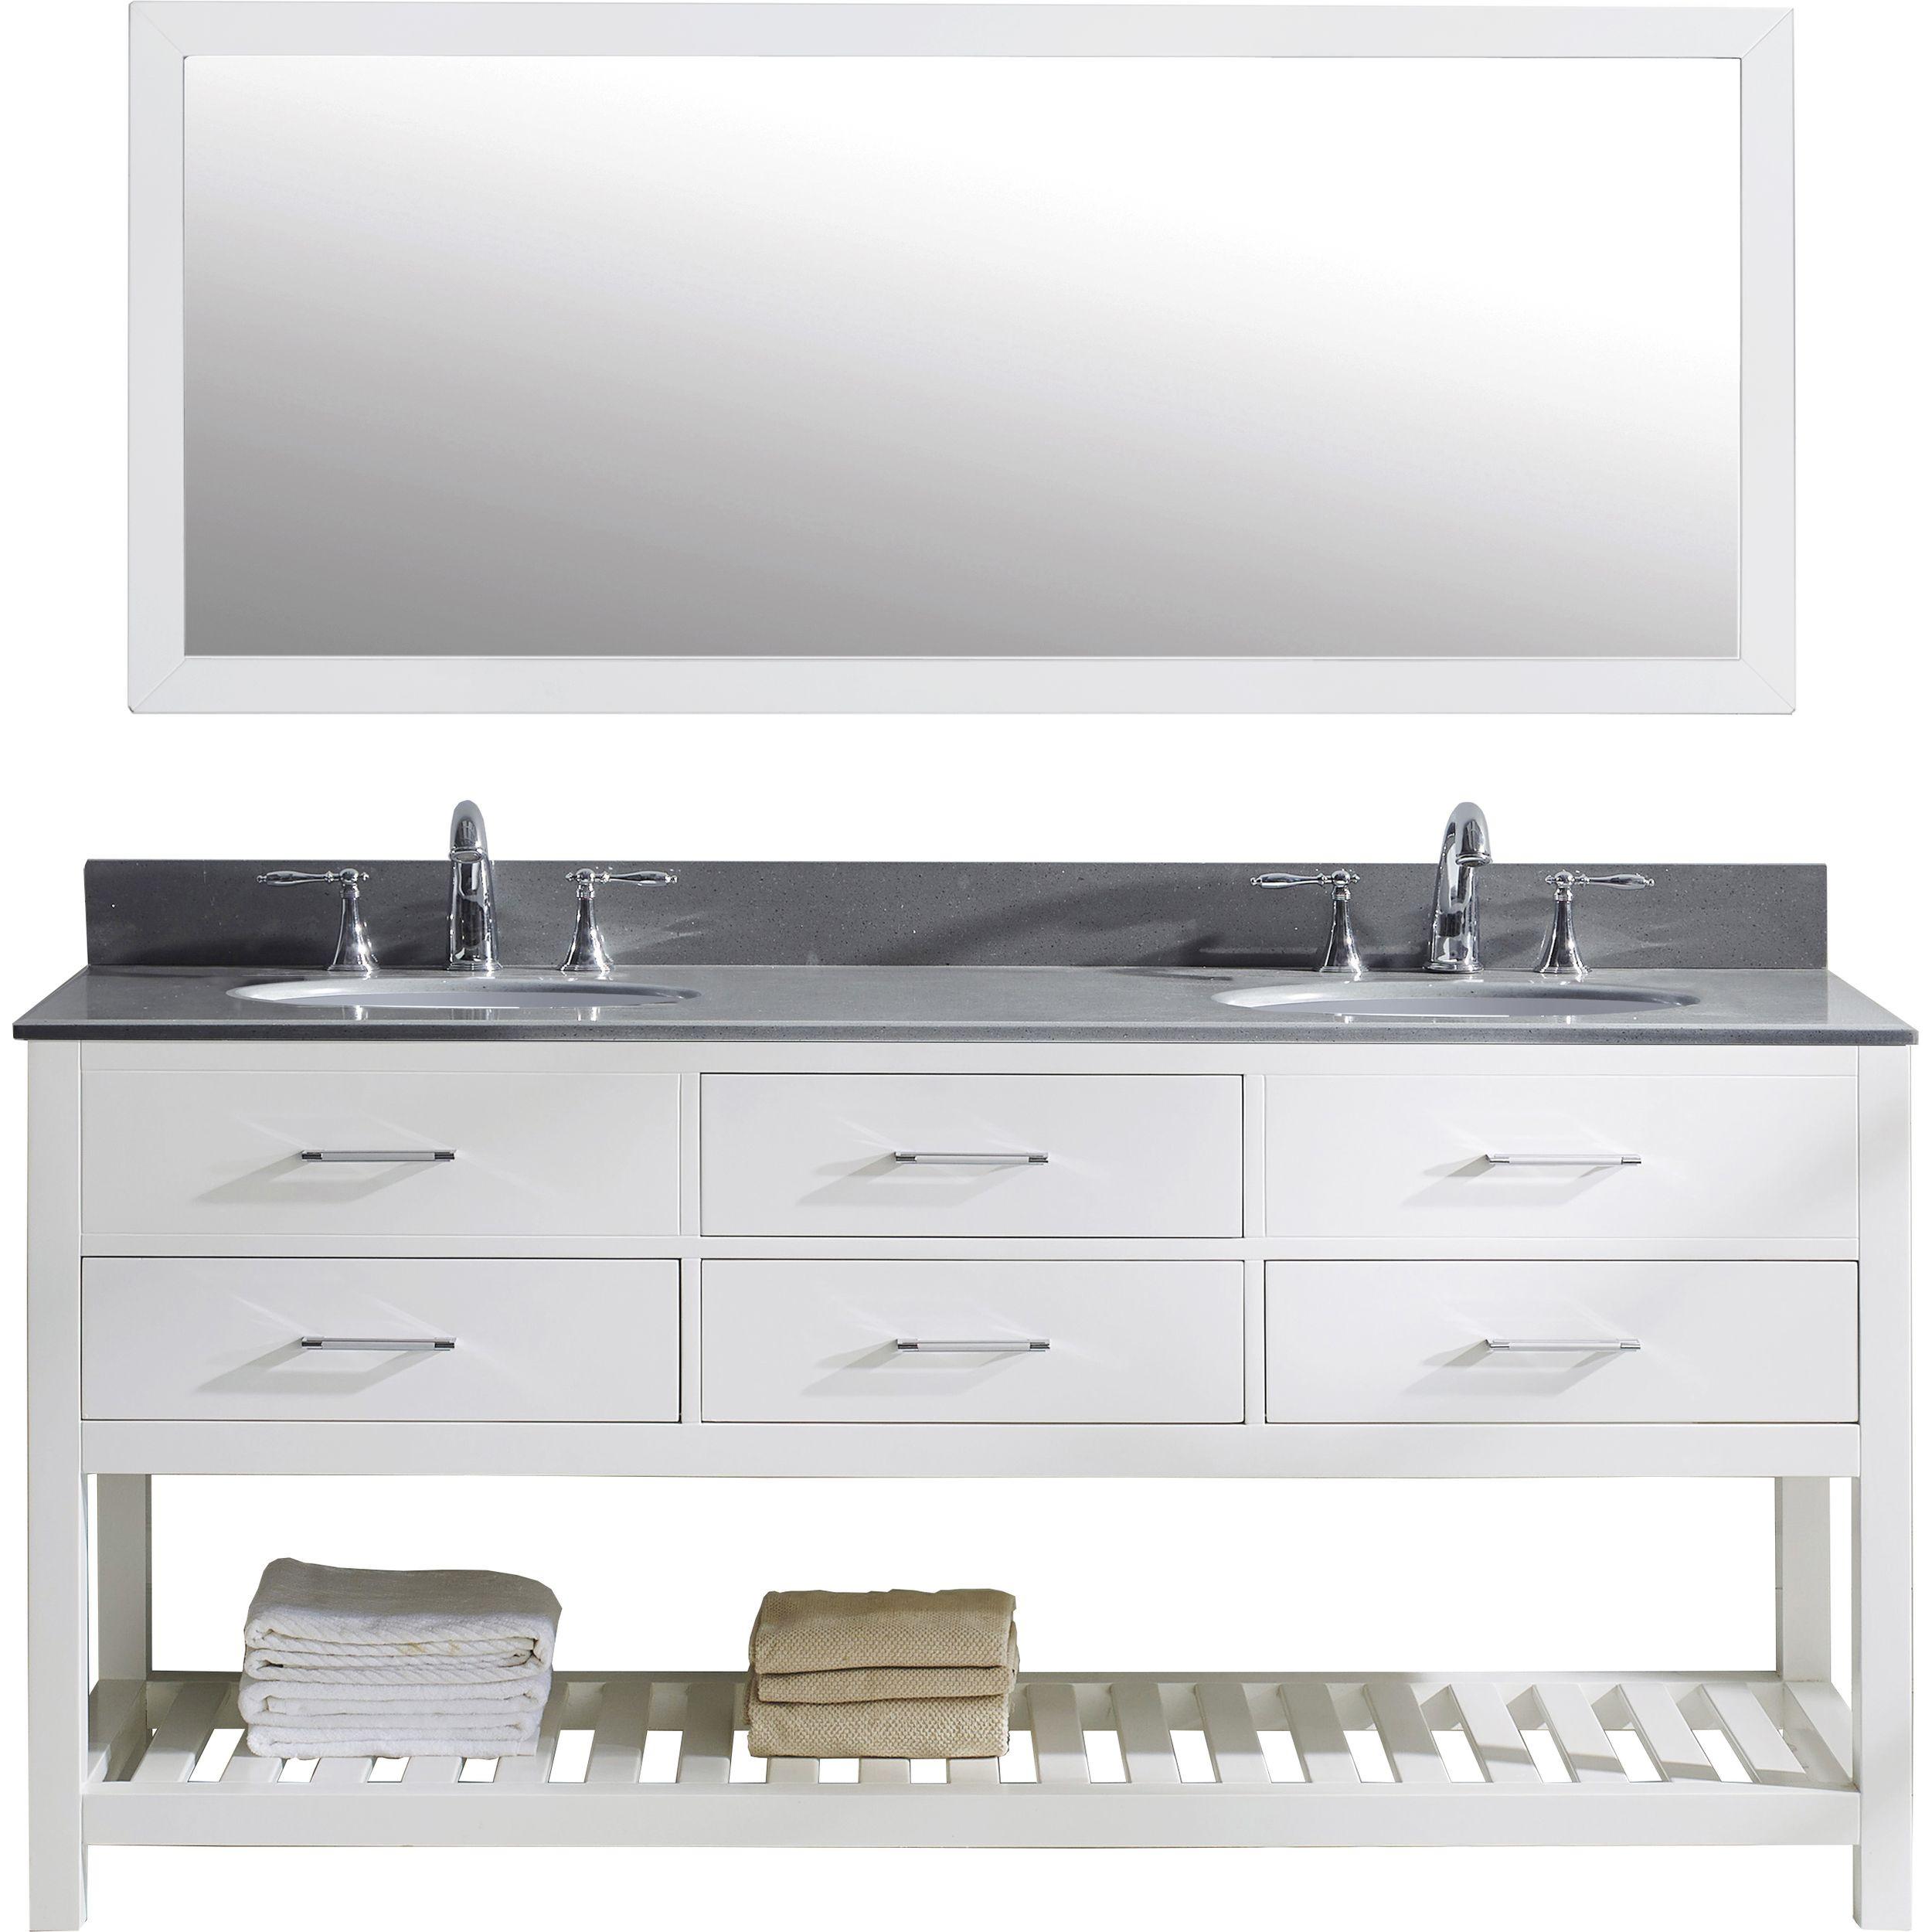 Virtu MD-2272-GQRO-WH-010 Caroline Estate 72 Inch Double Bathroom Vanity Set In White